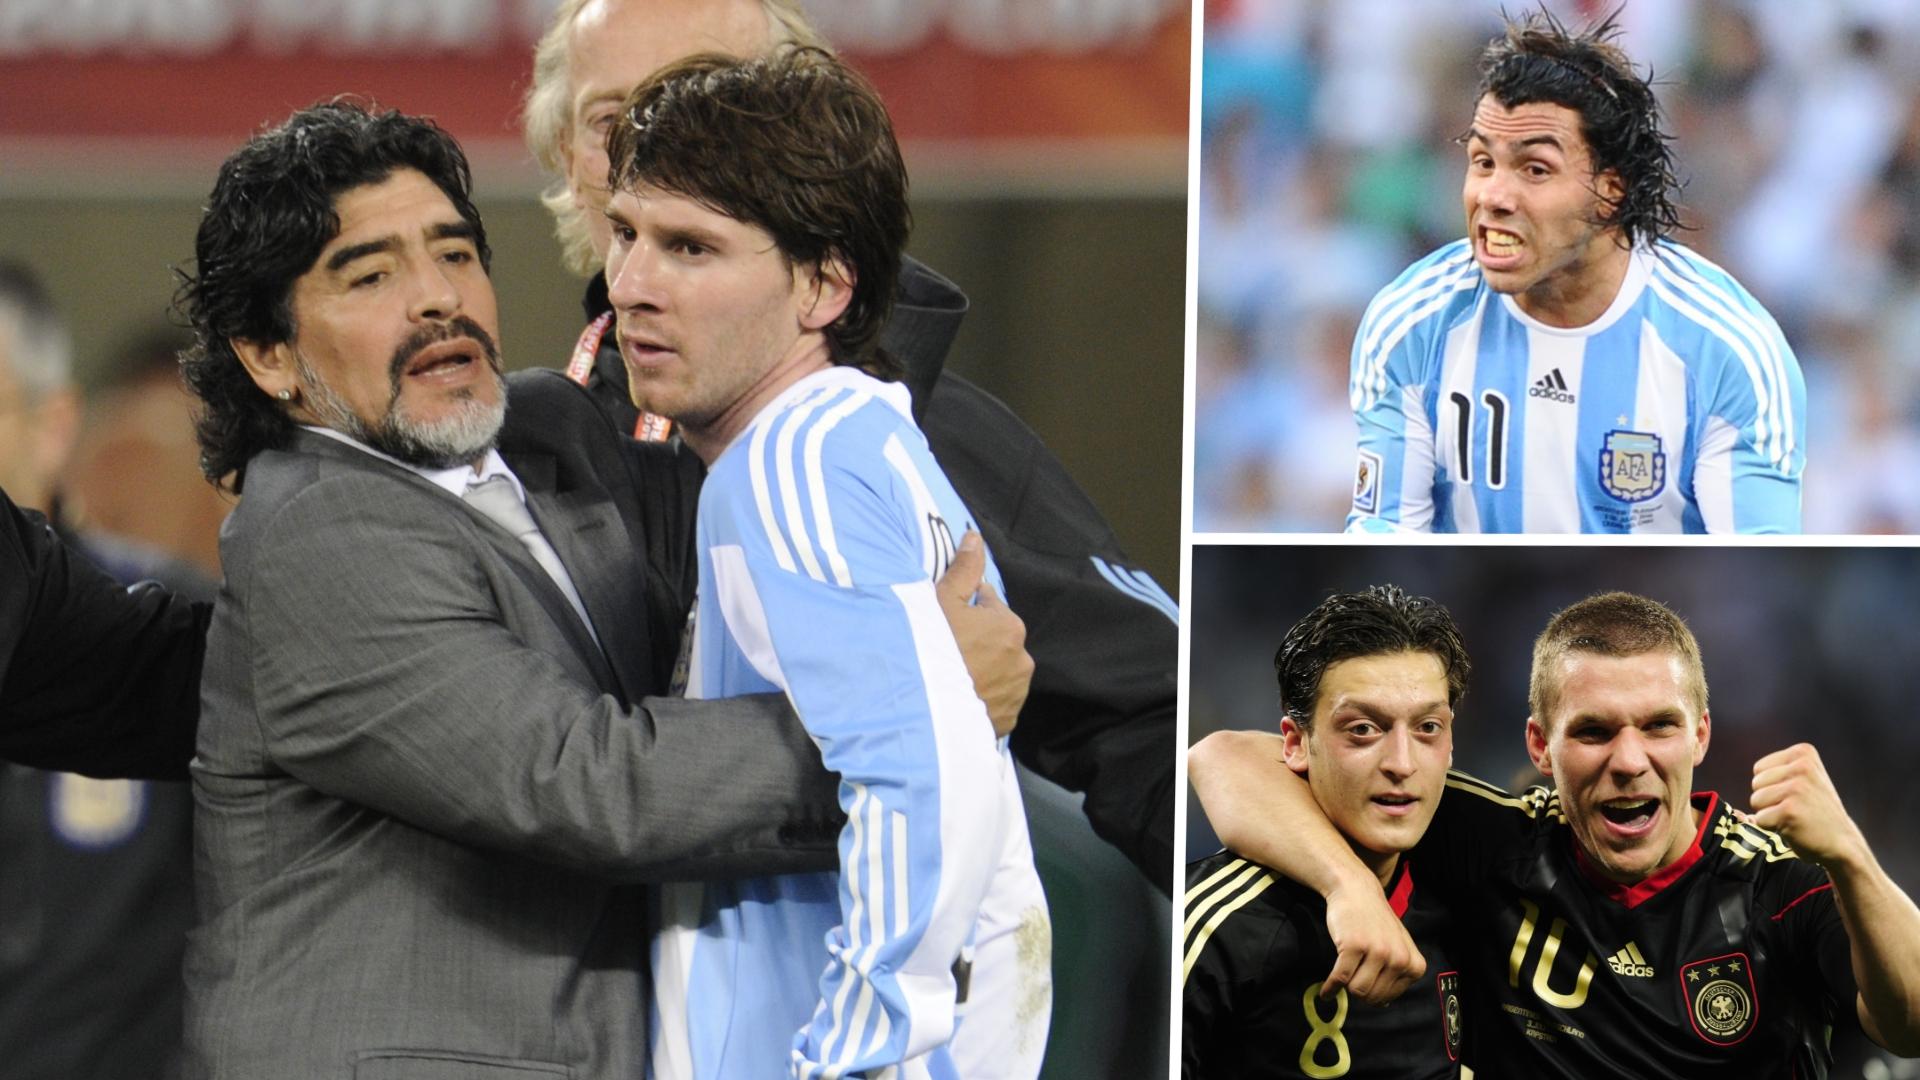 Maradona: Neymar is Brazils main hope to win the World Cup